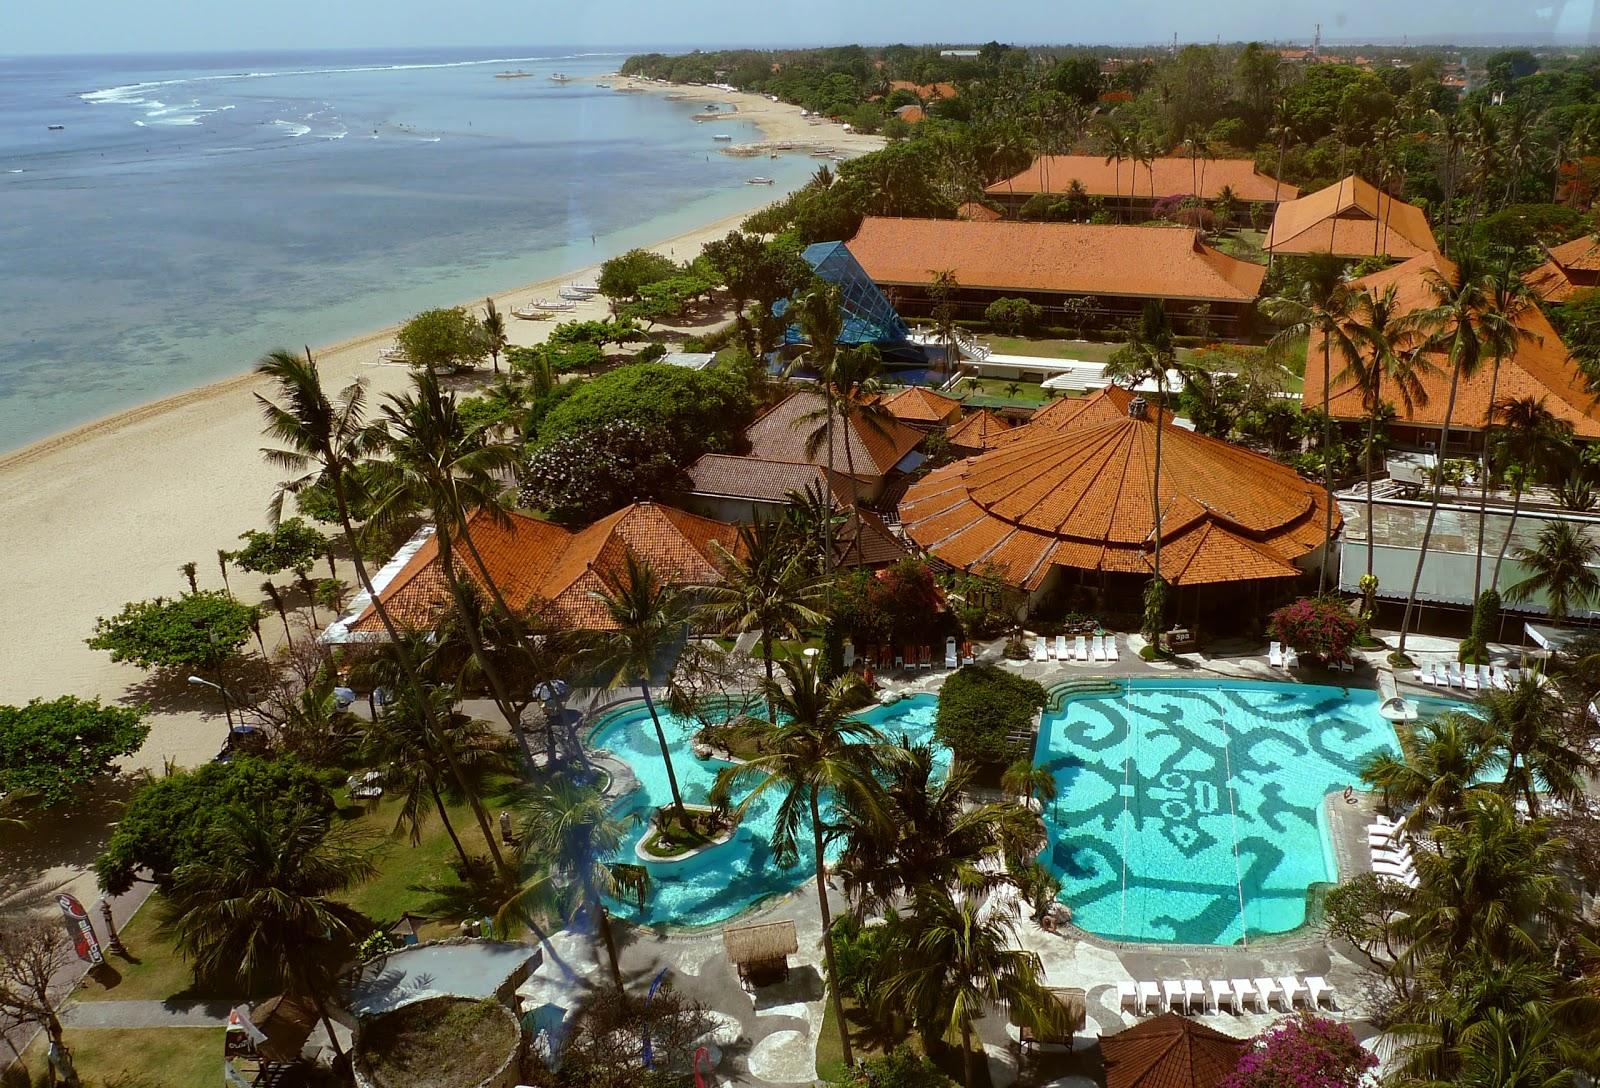 http://2.bp.blogspot.com/_HTYvANC5eiA/TNq_ev7p2CI/AAAAAAAAAJQ/FXWDPxpJ6I4/s1600/the+hotel+bali+beach.jpg